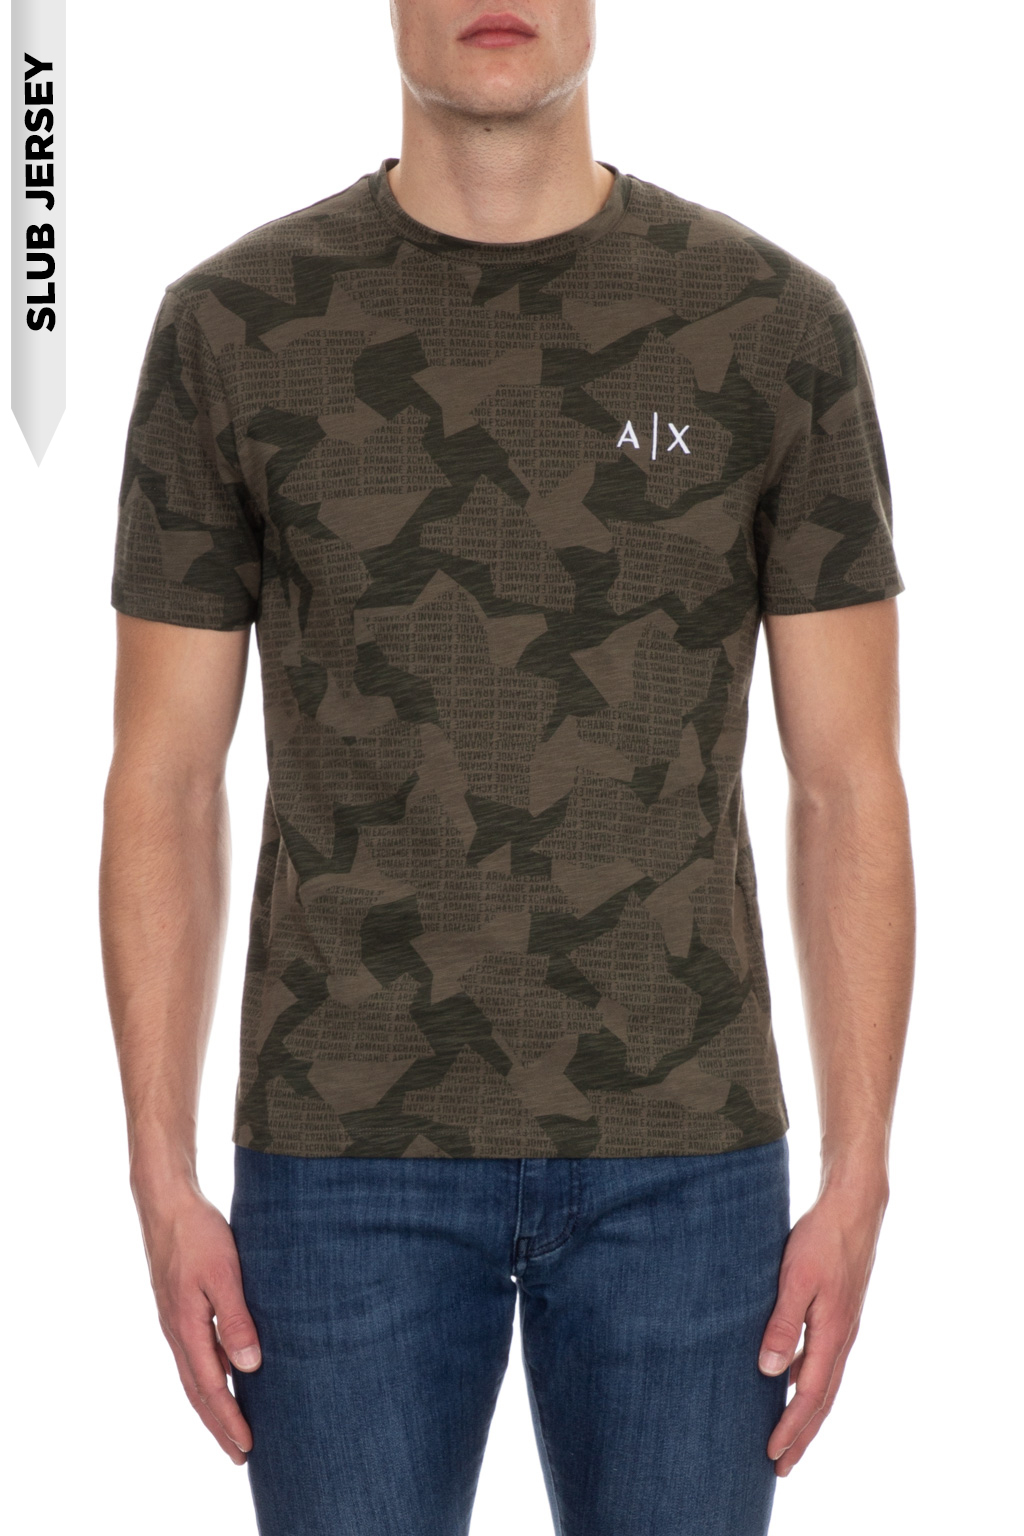 T-shirt manica corta uomo militare camo ARMANI EXCHANGE